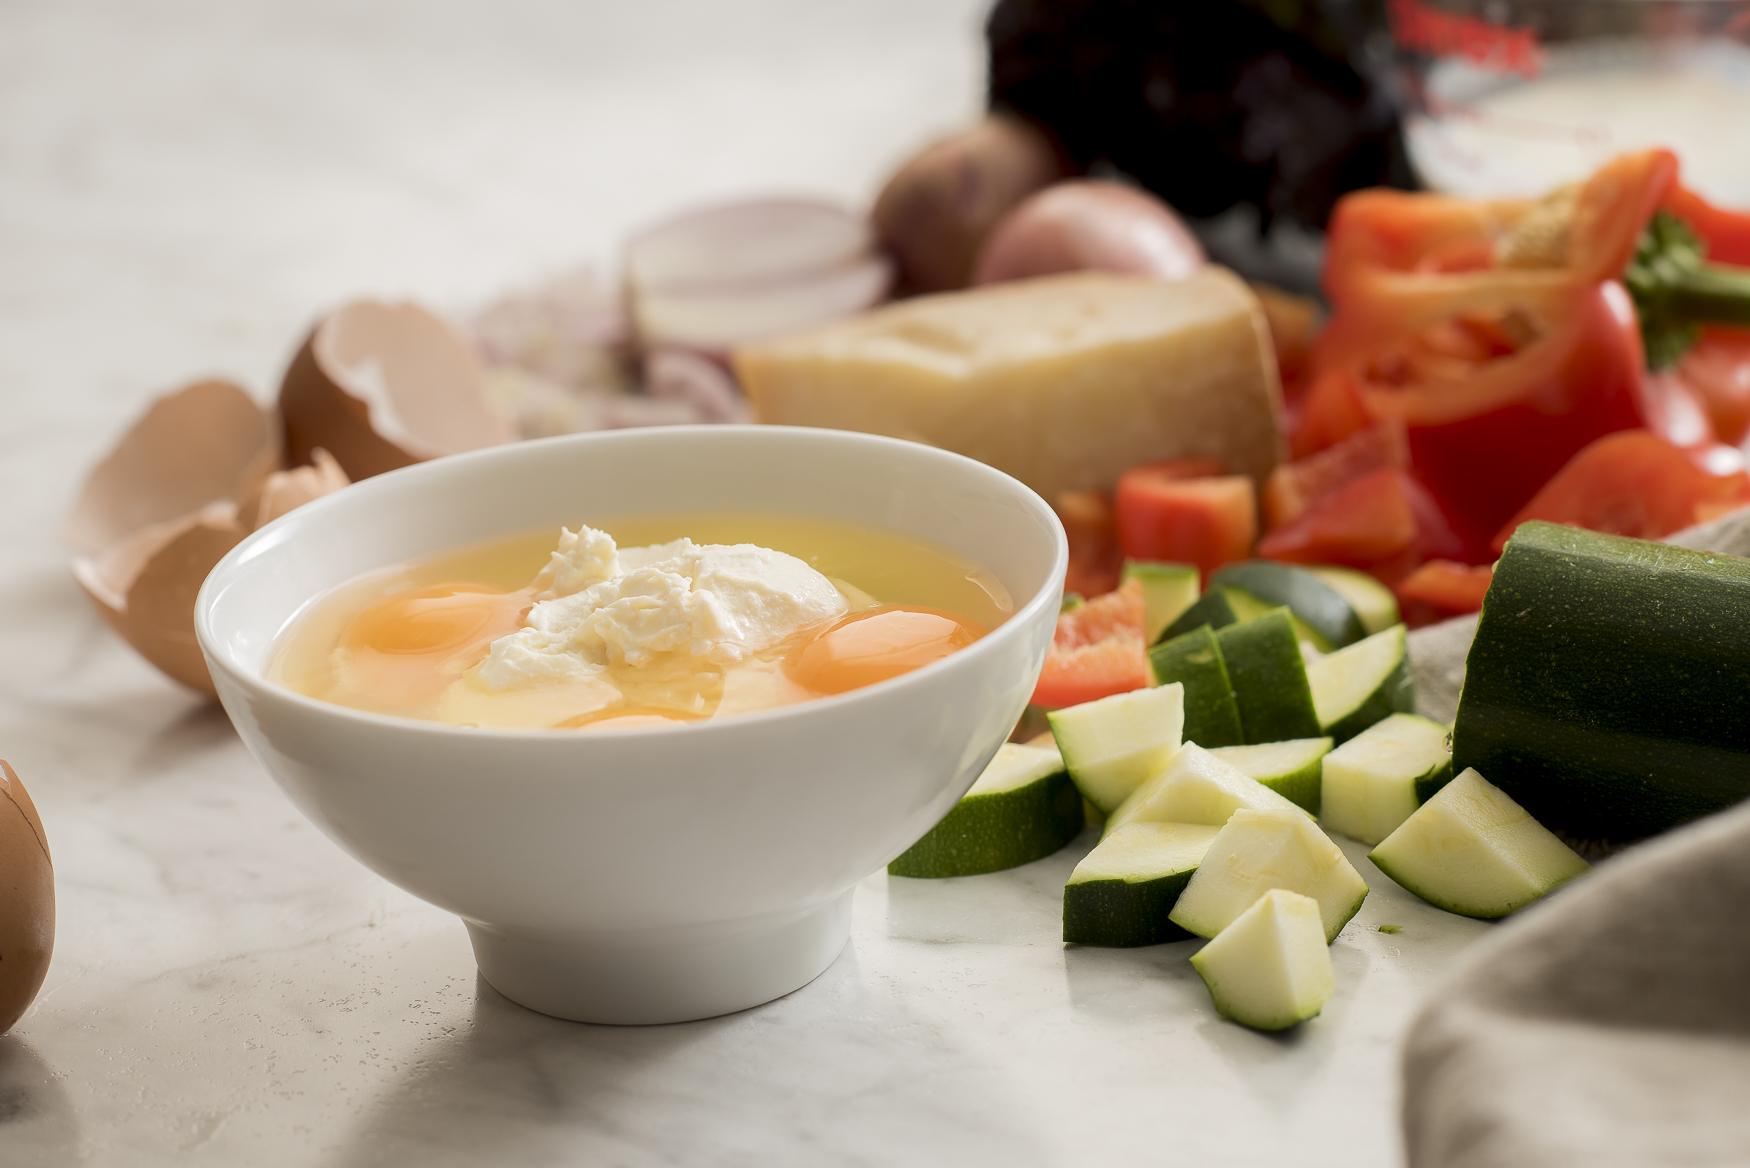 FAT-Veggie-Quiche-Vancouver-Food-103.jpg